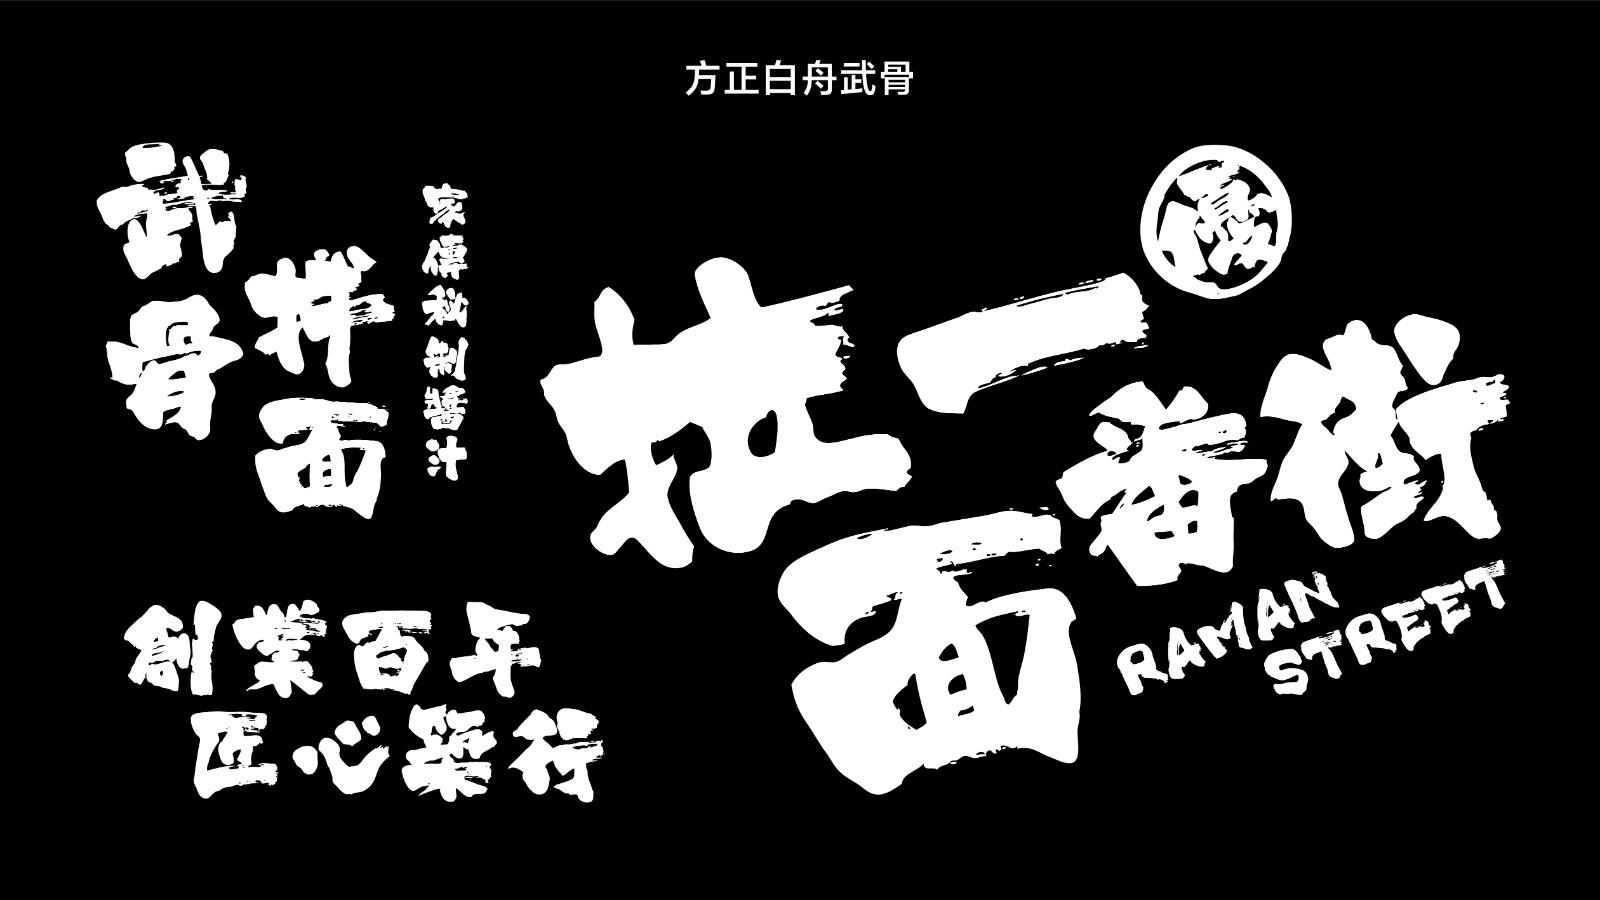 https://ft-bk1.oss-cn-zhangjiakou.aliyuncs.com/Public/Uploads/img/n_content_20201210180157_8901.jpg